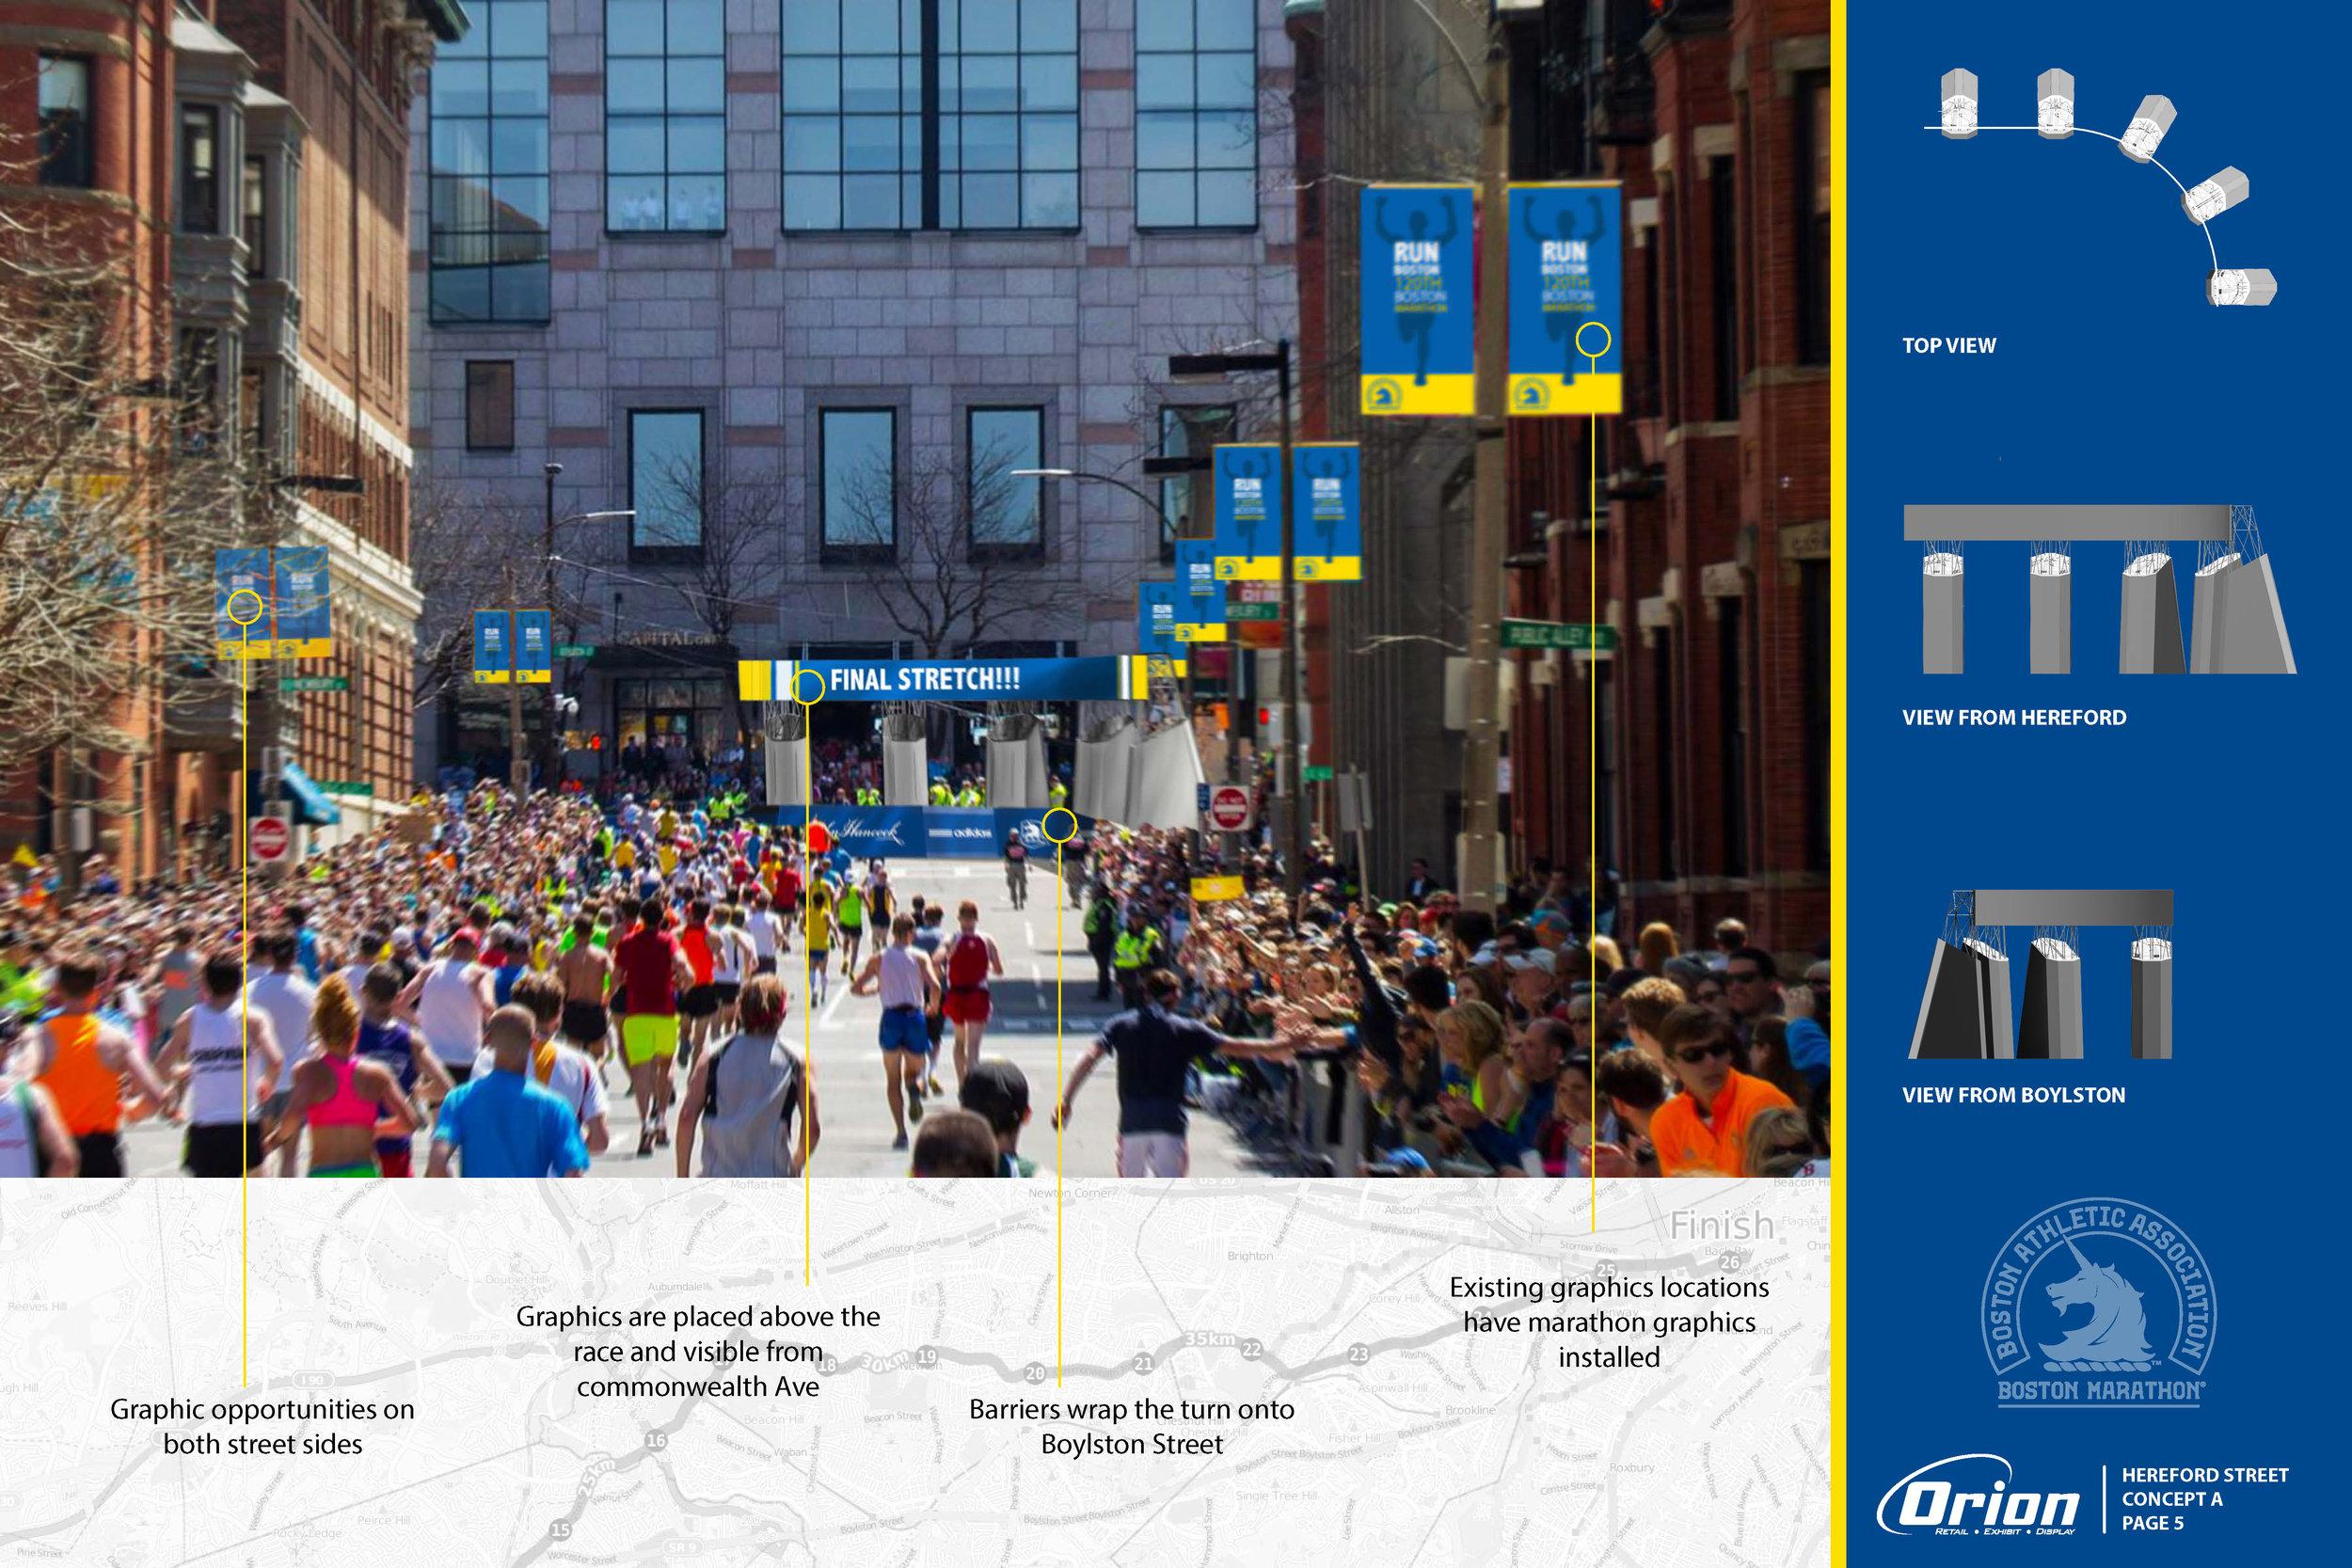 BostonMarathon%20Presentation_Concept%20A 1_Page_5.jpg